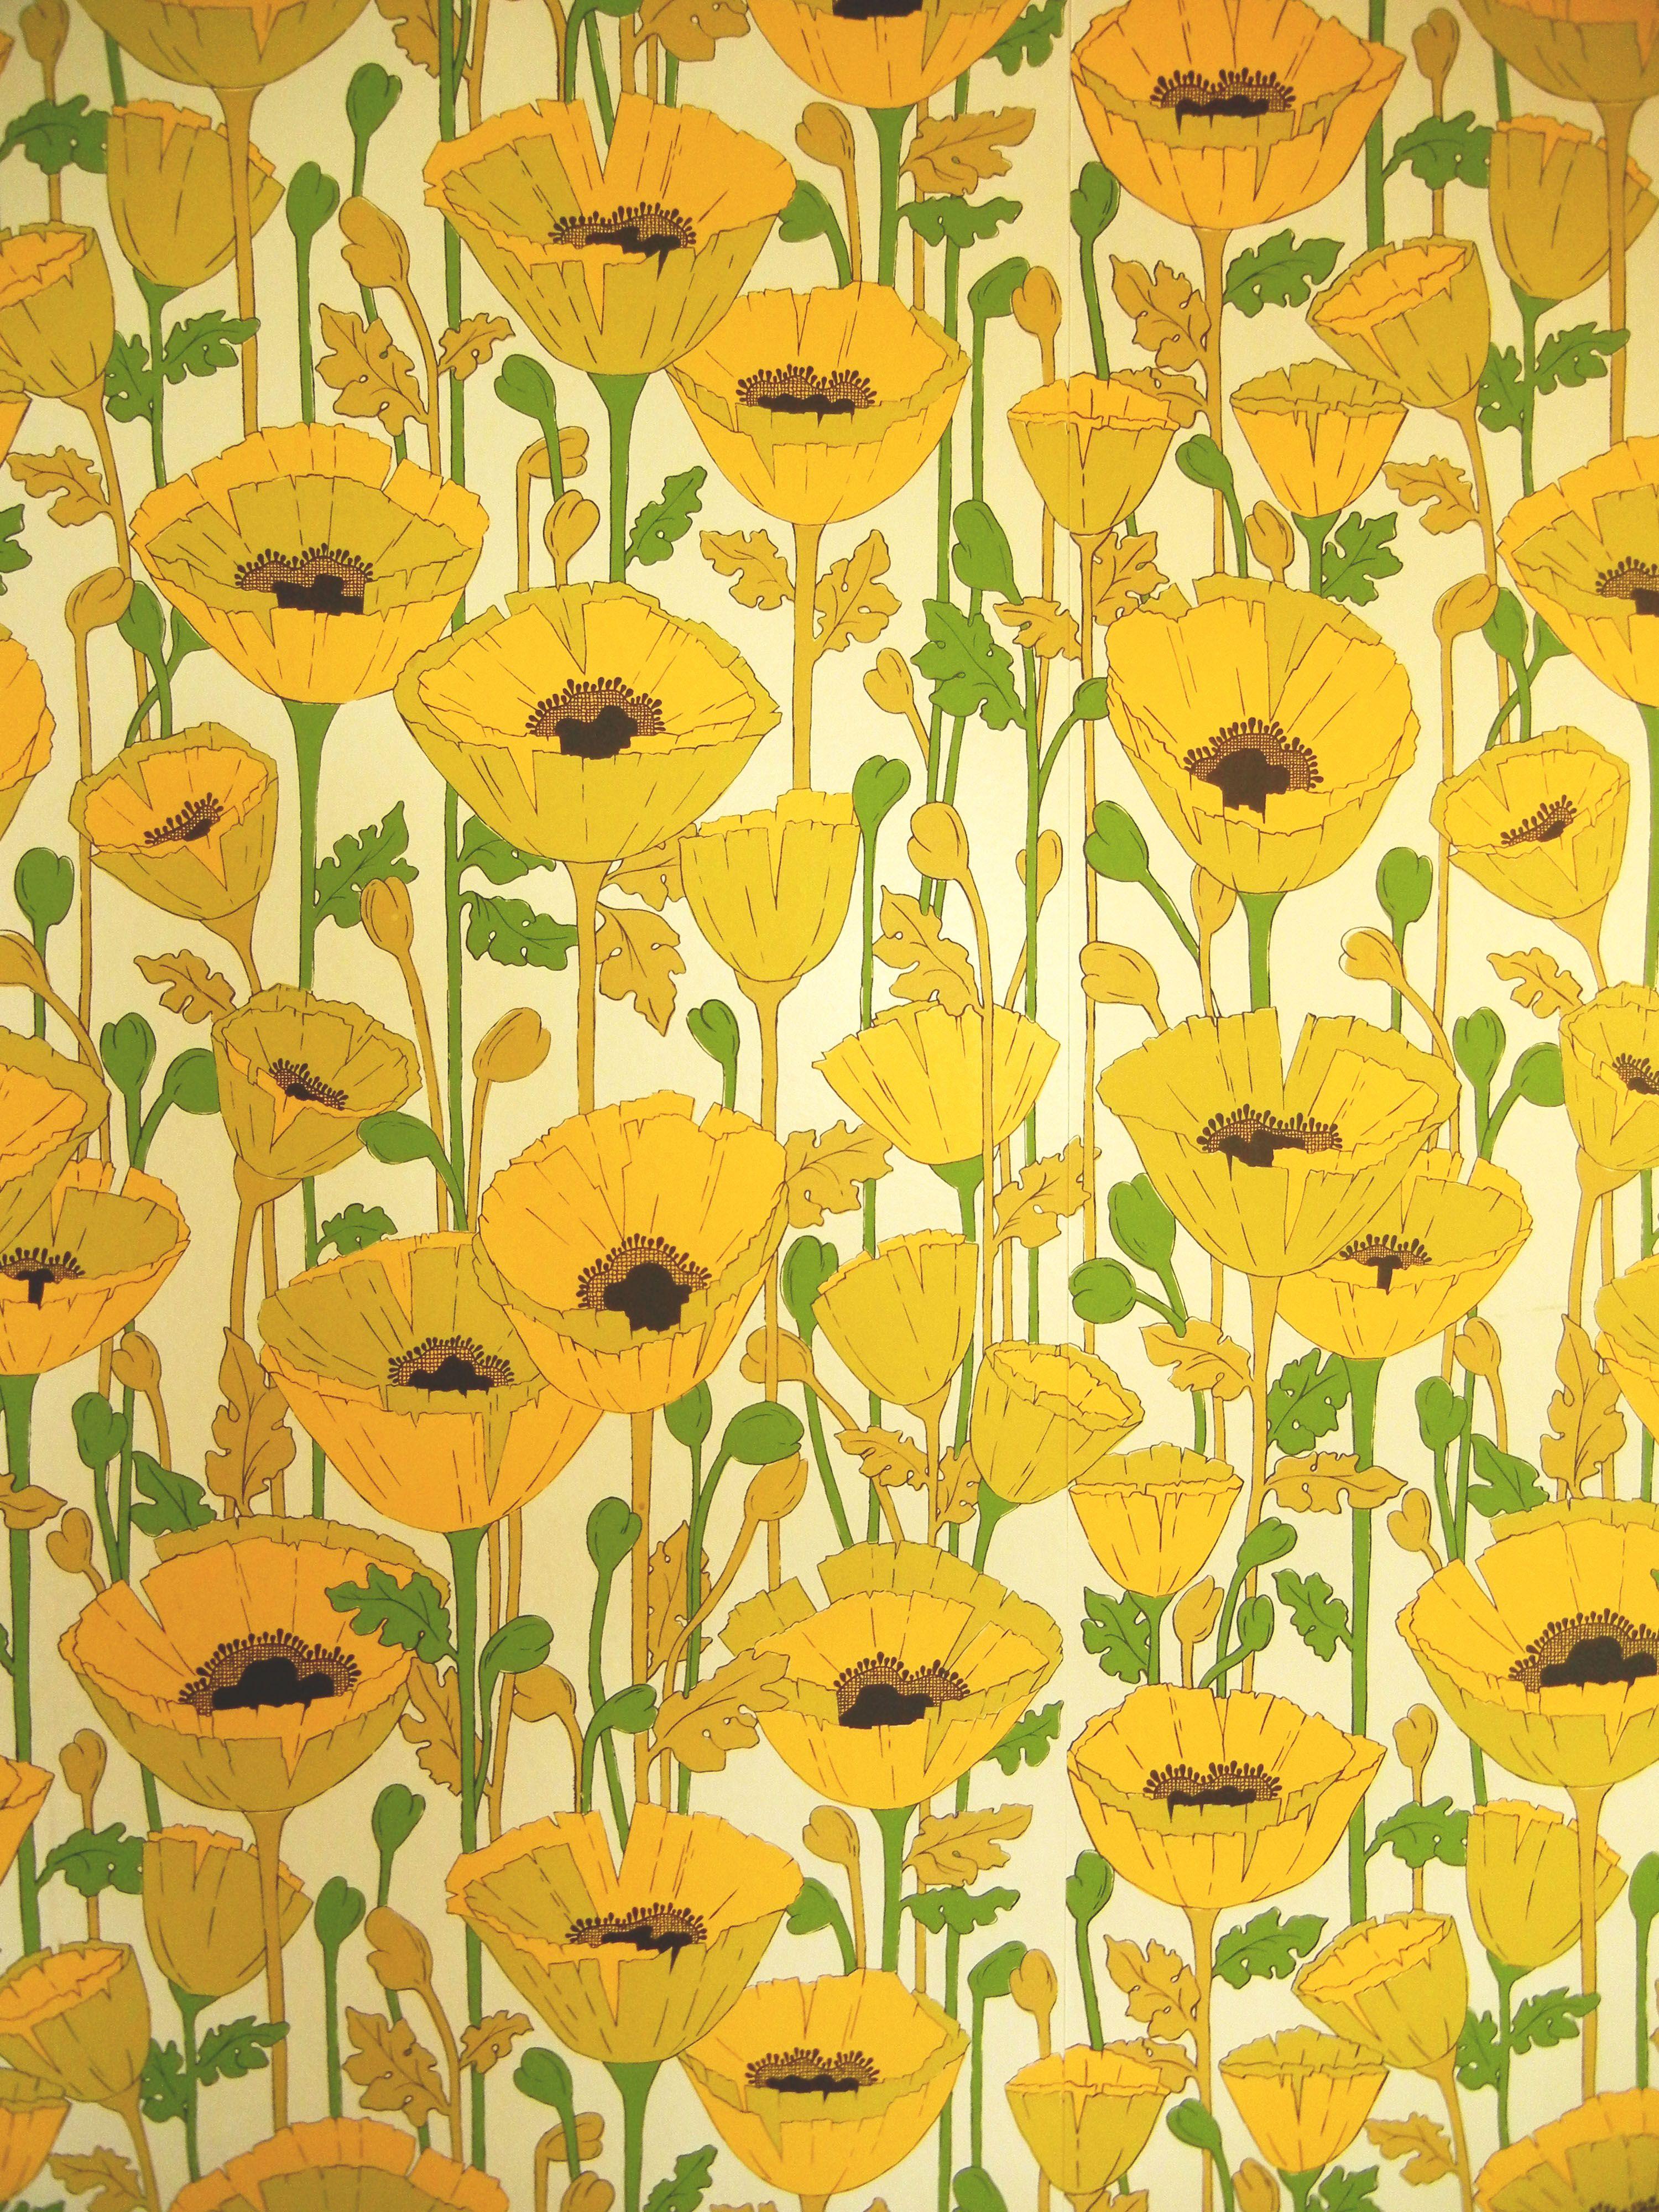 Vintage kitchen wallpaper patterns - 60 S Wallpaper Inspiration For A Fresh Color Scheme Via Ari Jerue